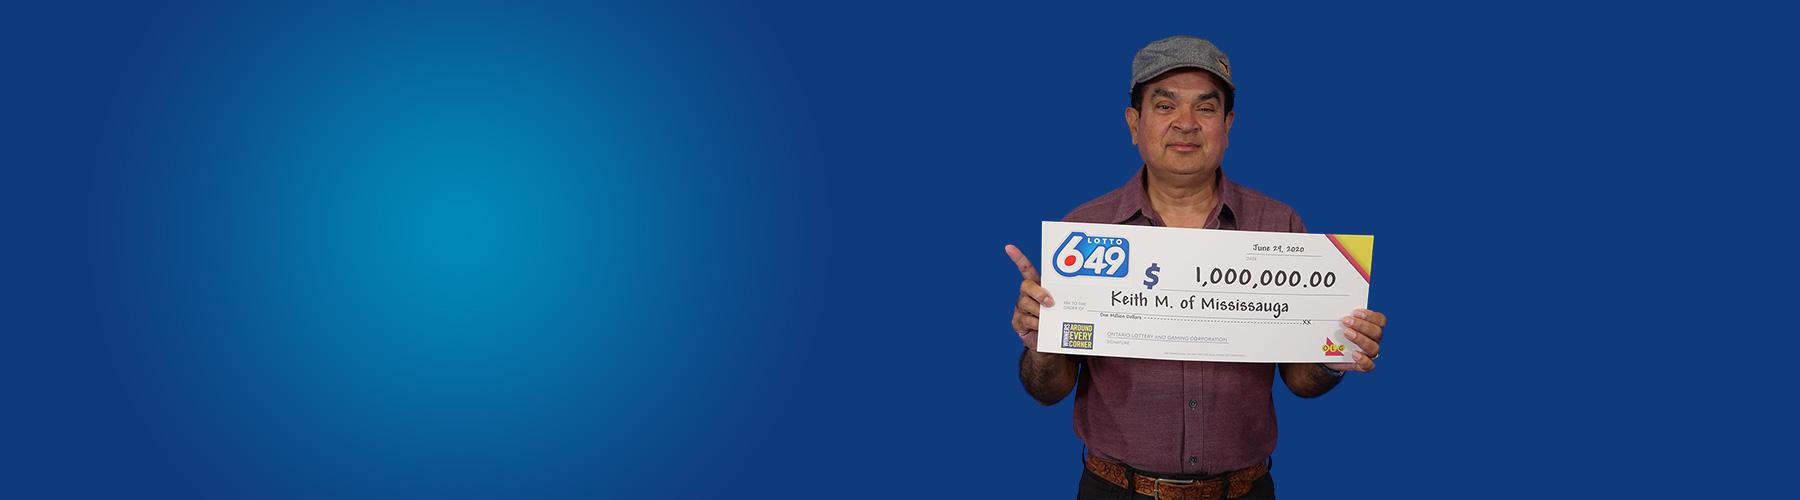 Gagnant à lotto 649